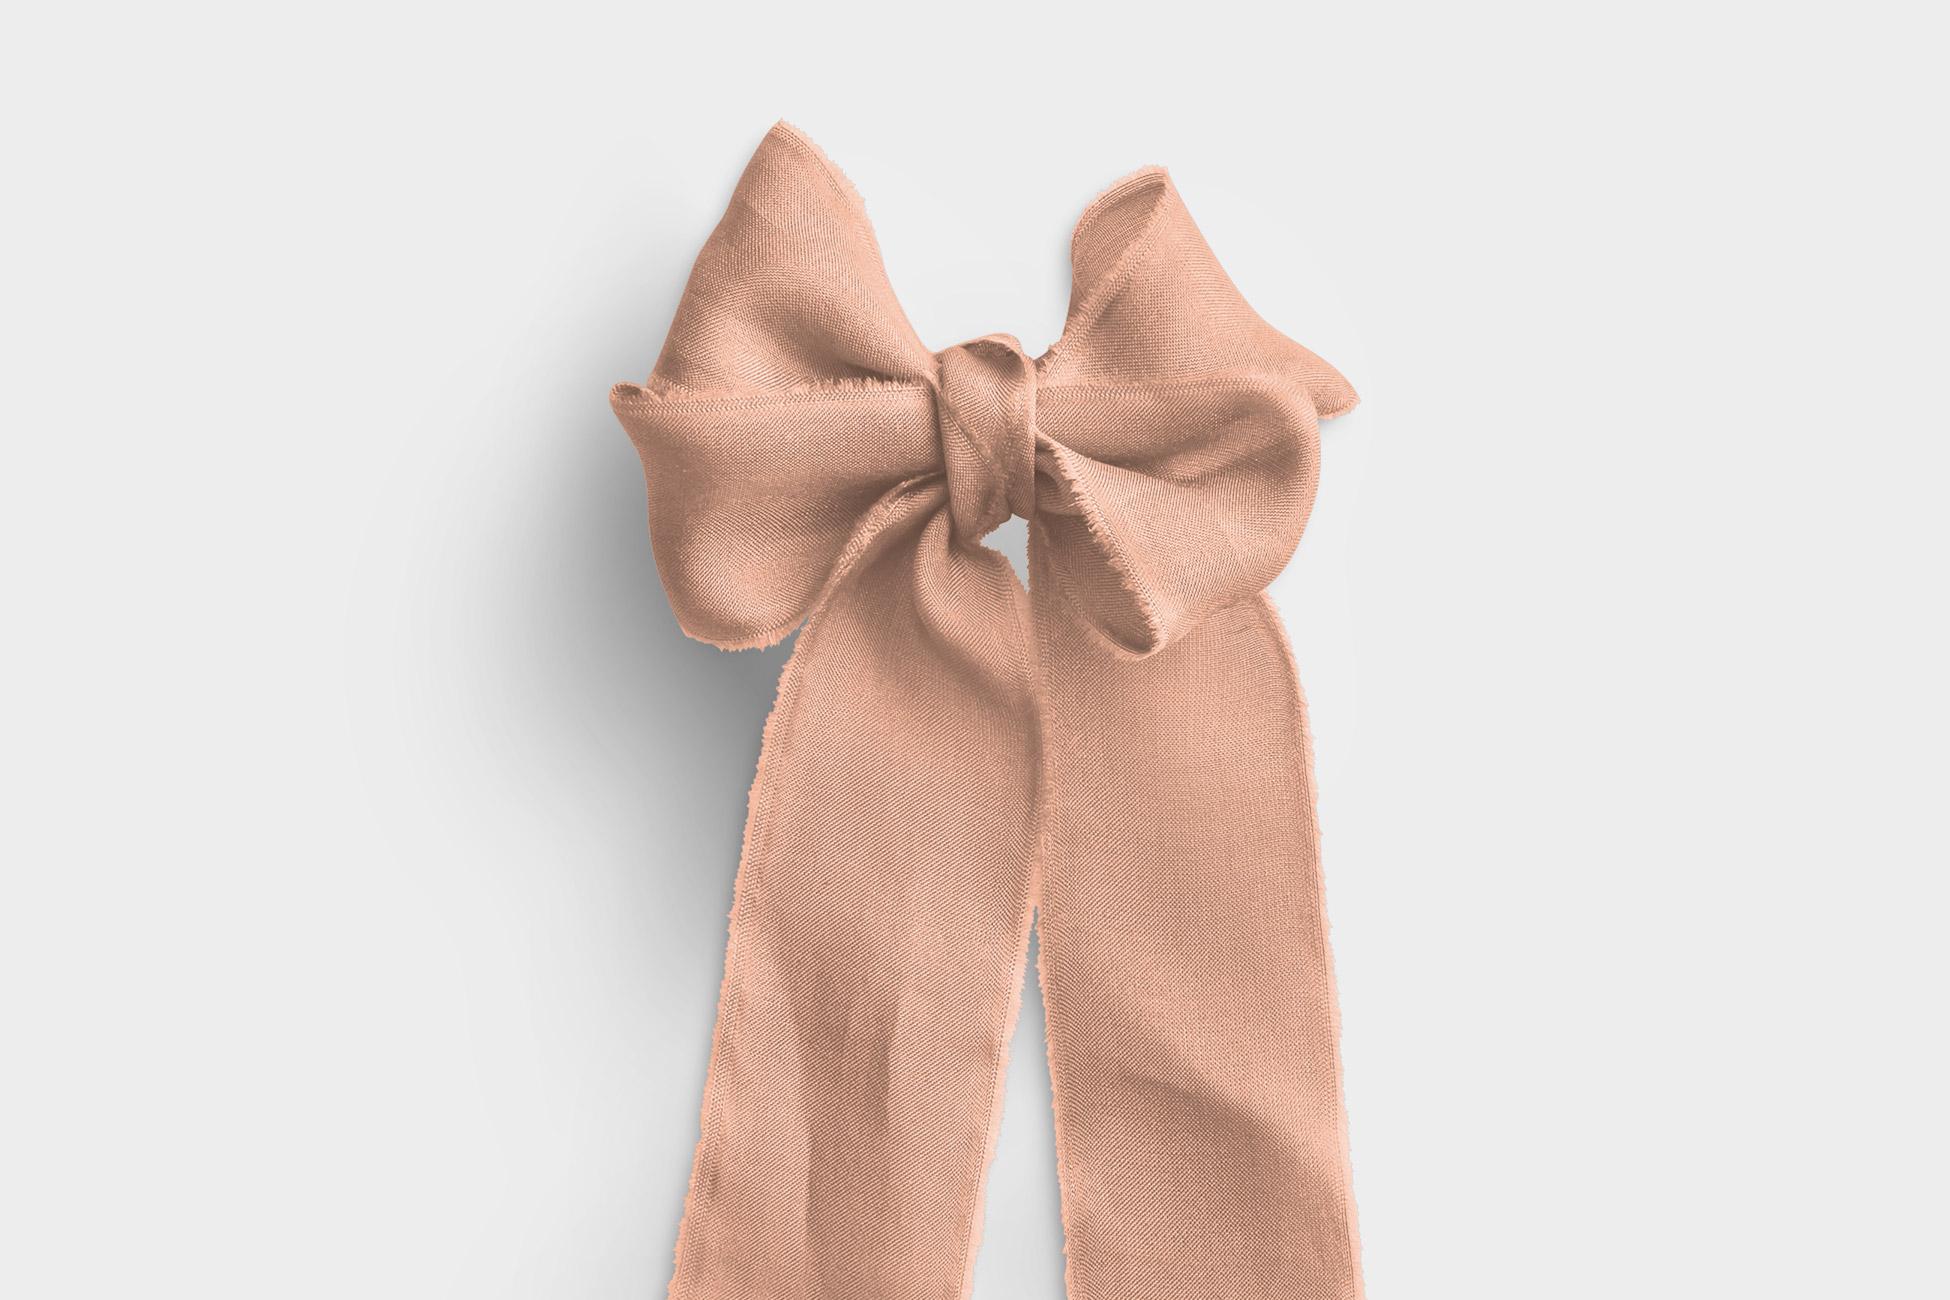 Silk Ribbons Volume 3 High Resolution